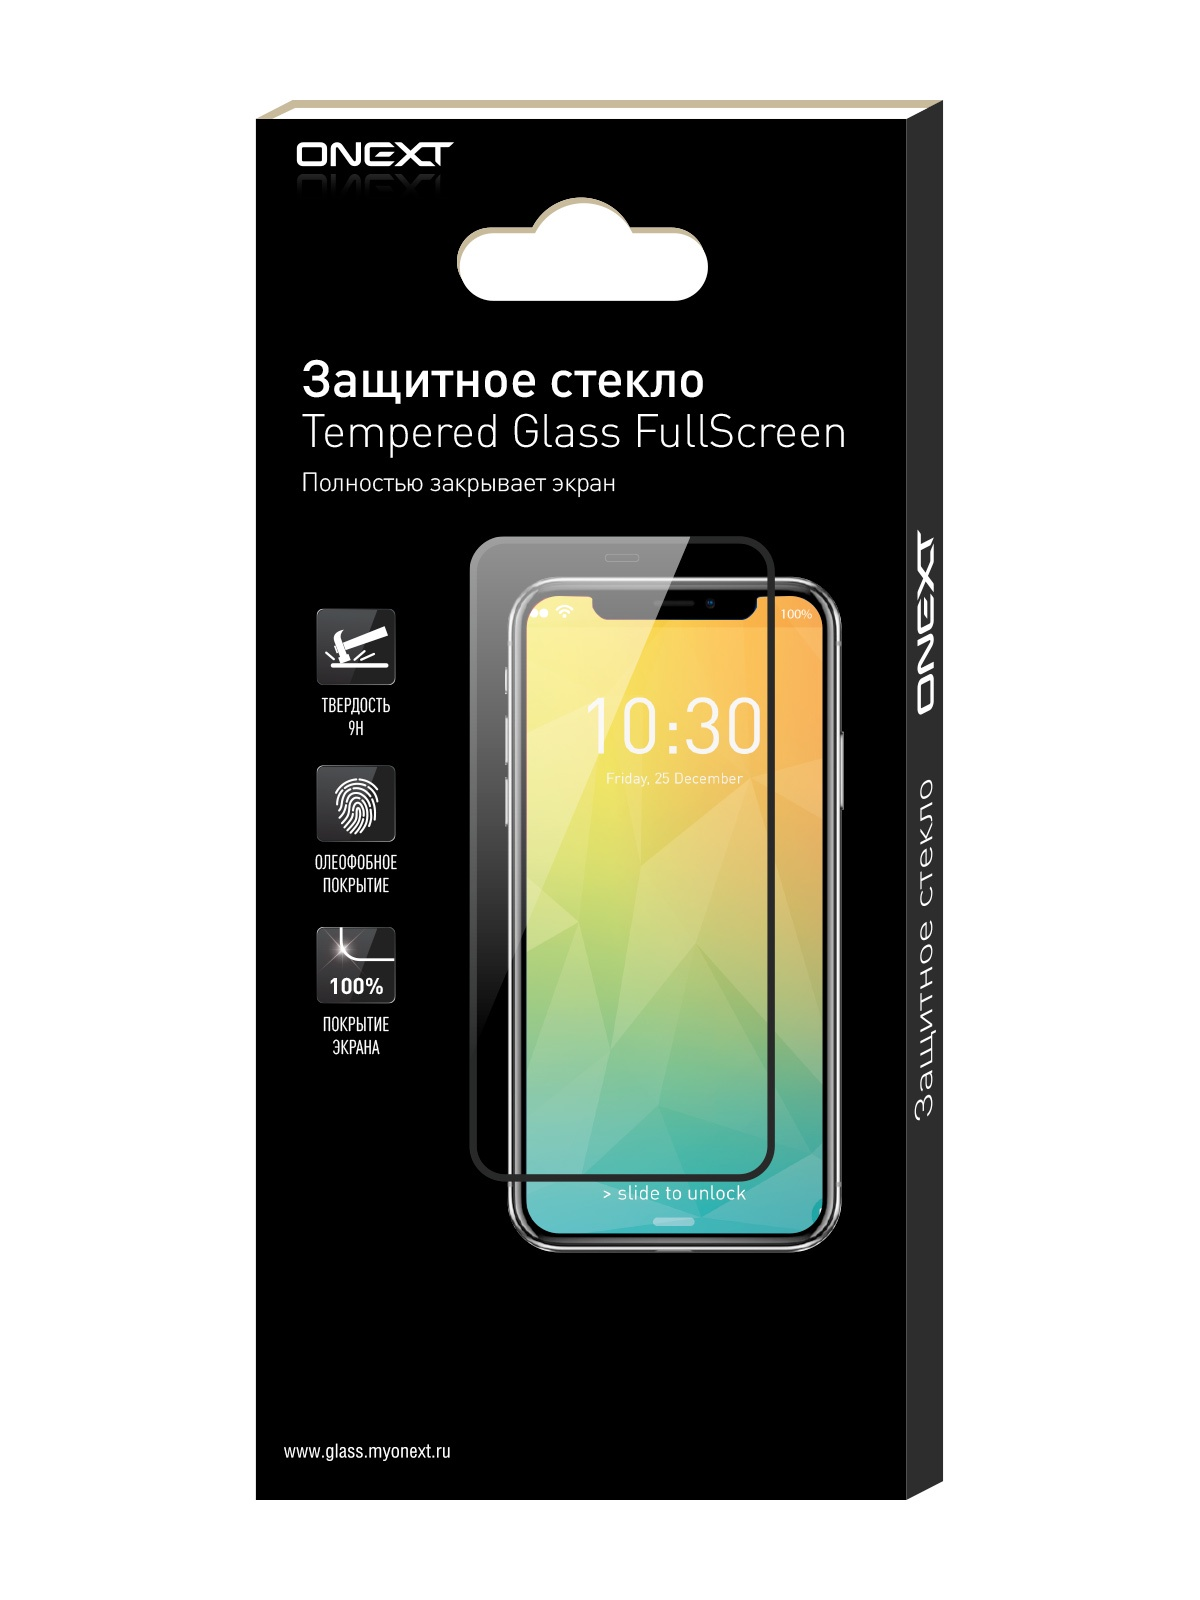 Защитное стекло ONEXT Samsung Galaxy A6 plus, с рамкой синее, full glue аксессуар защитное стекло для samsung galaxy a6 onext full glue gold 41684